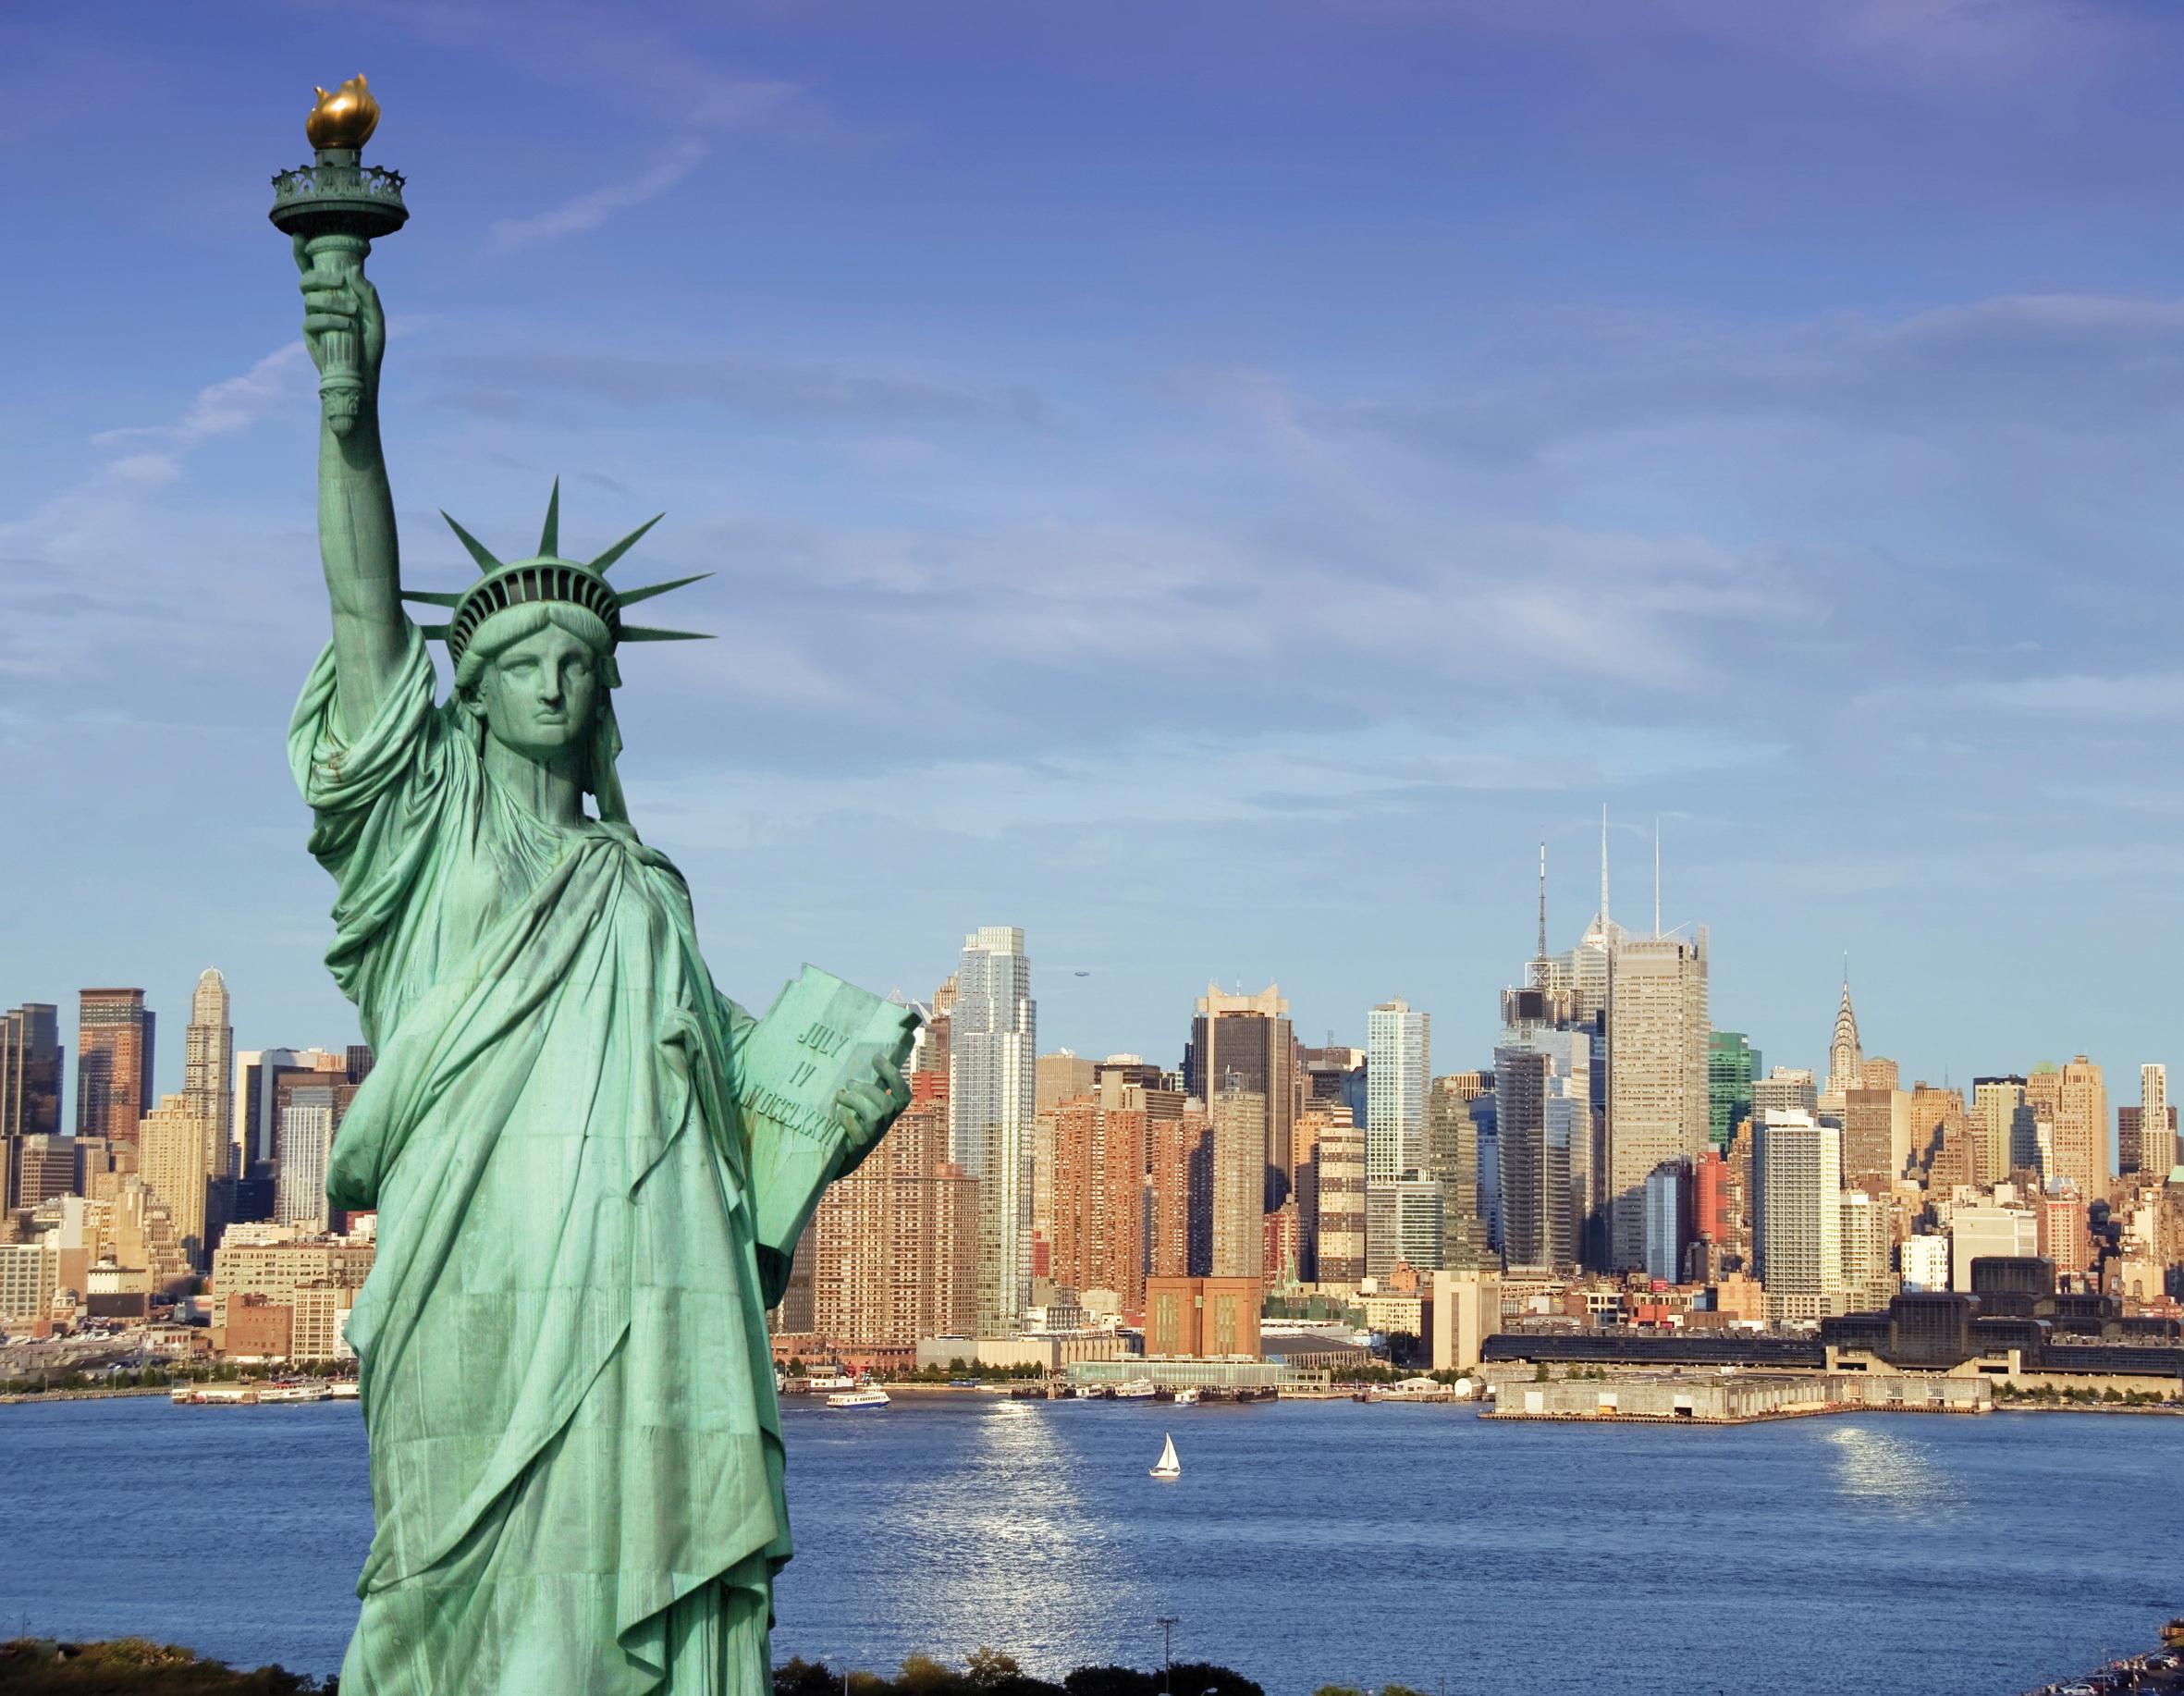 Statue Of Liberty Wallpaper 33436 HD Wallpapers Glefiacom 2362x1834